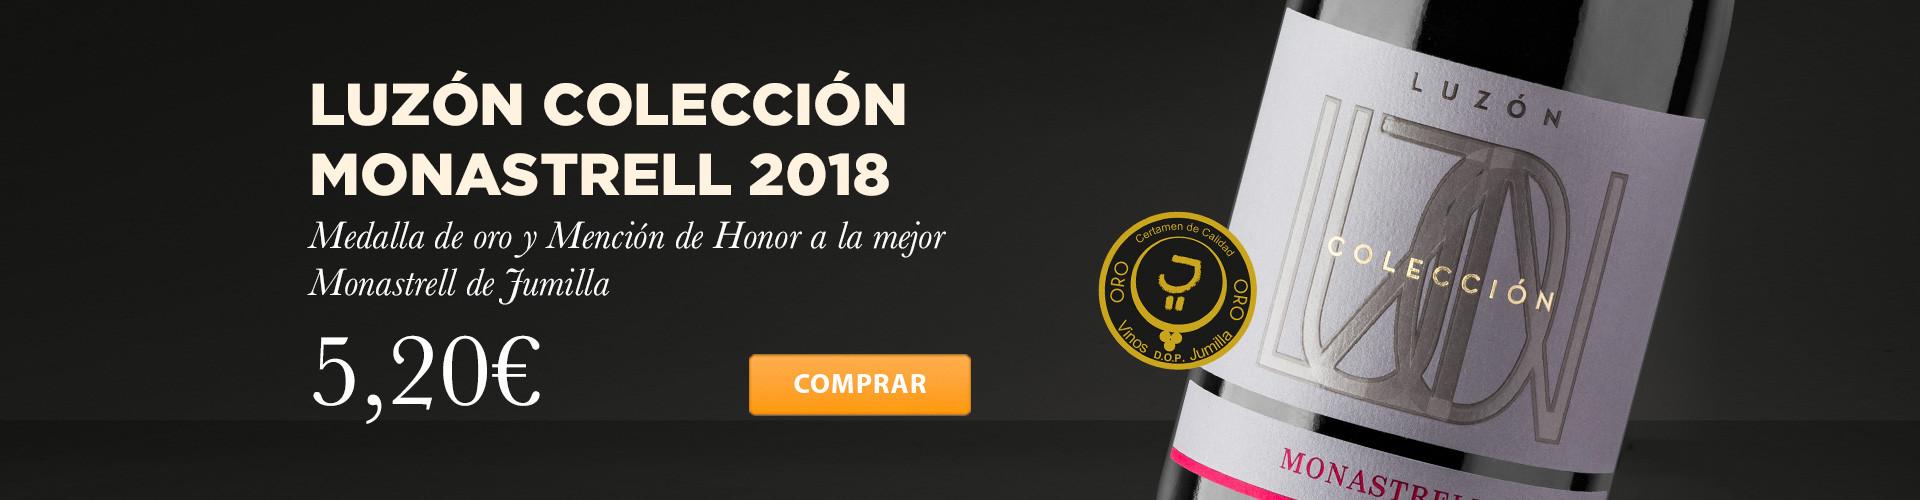 Mejor_monastrell